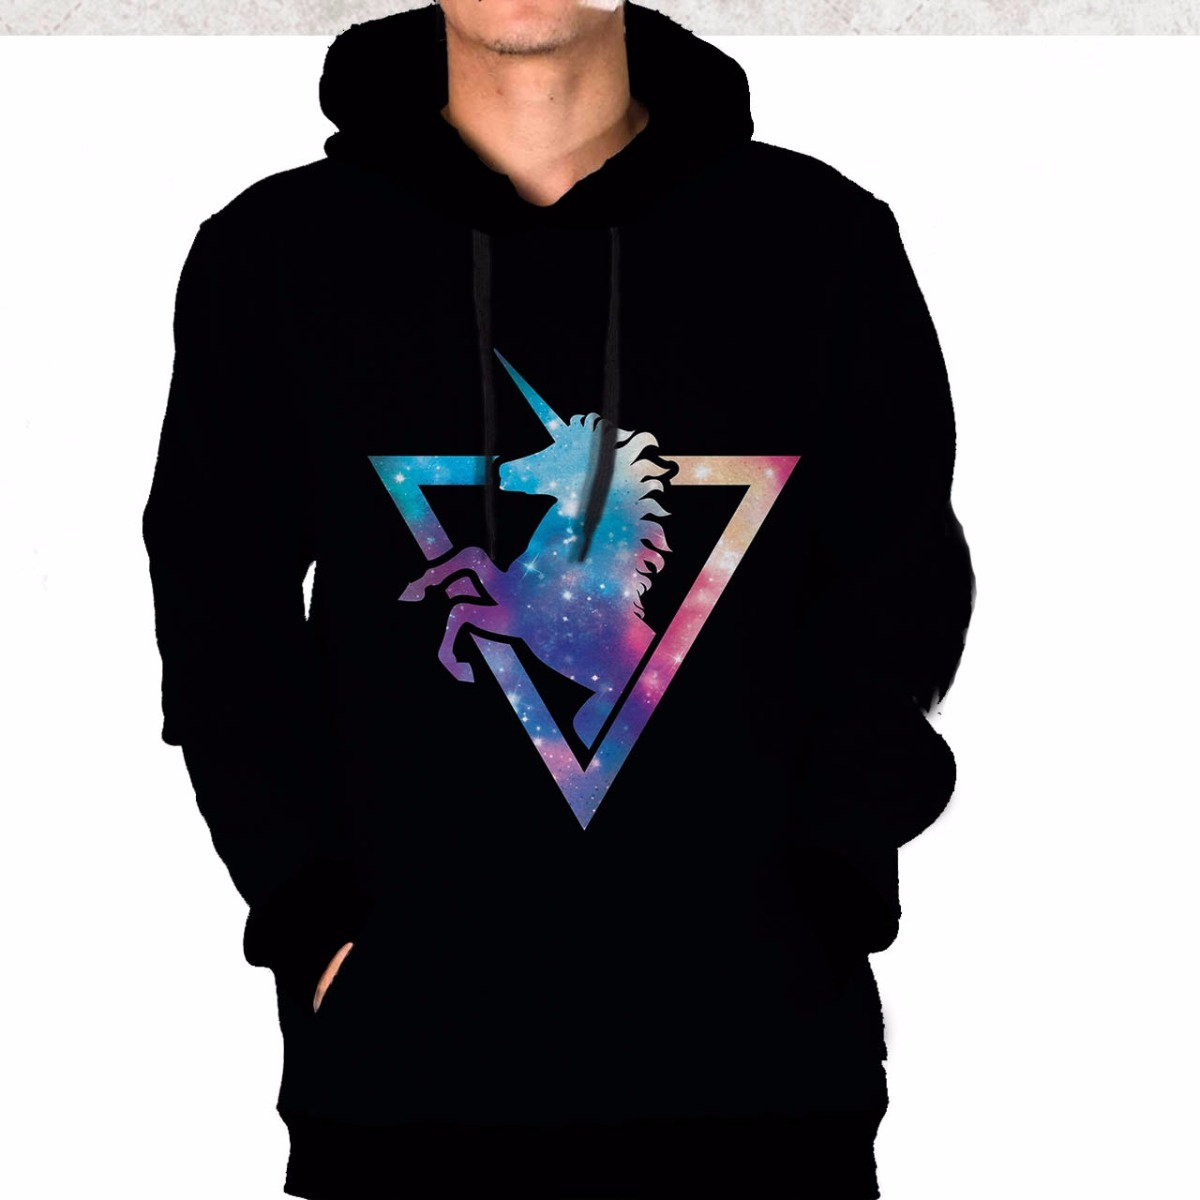 ceb77d0ea casaco blusa moletom unicórnio universo triângulo tumblr. Carregando zoom.